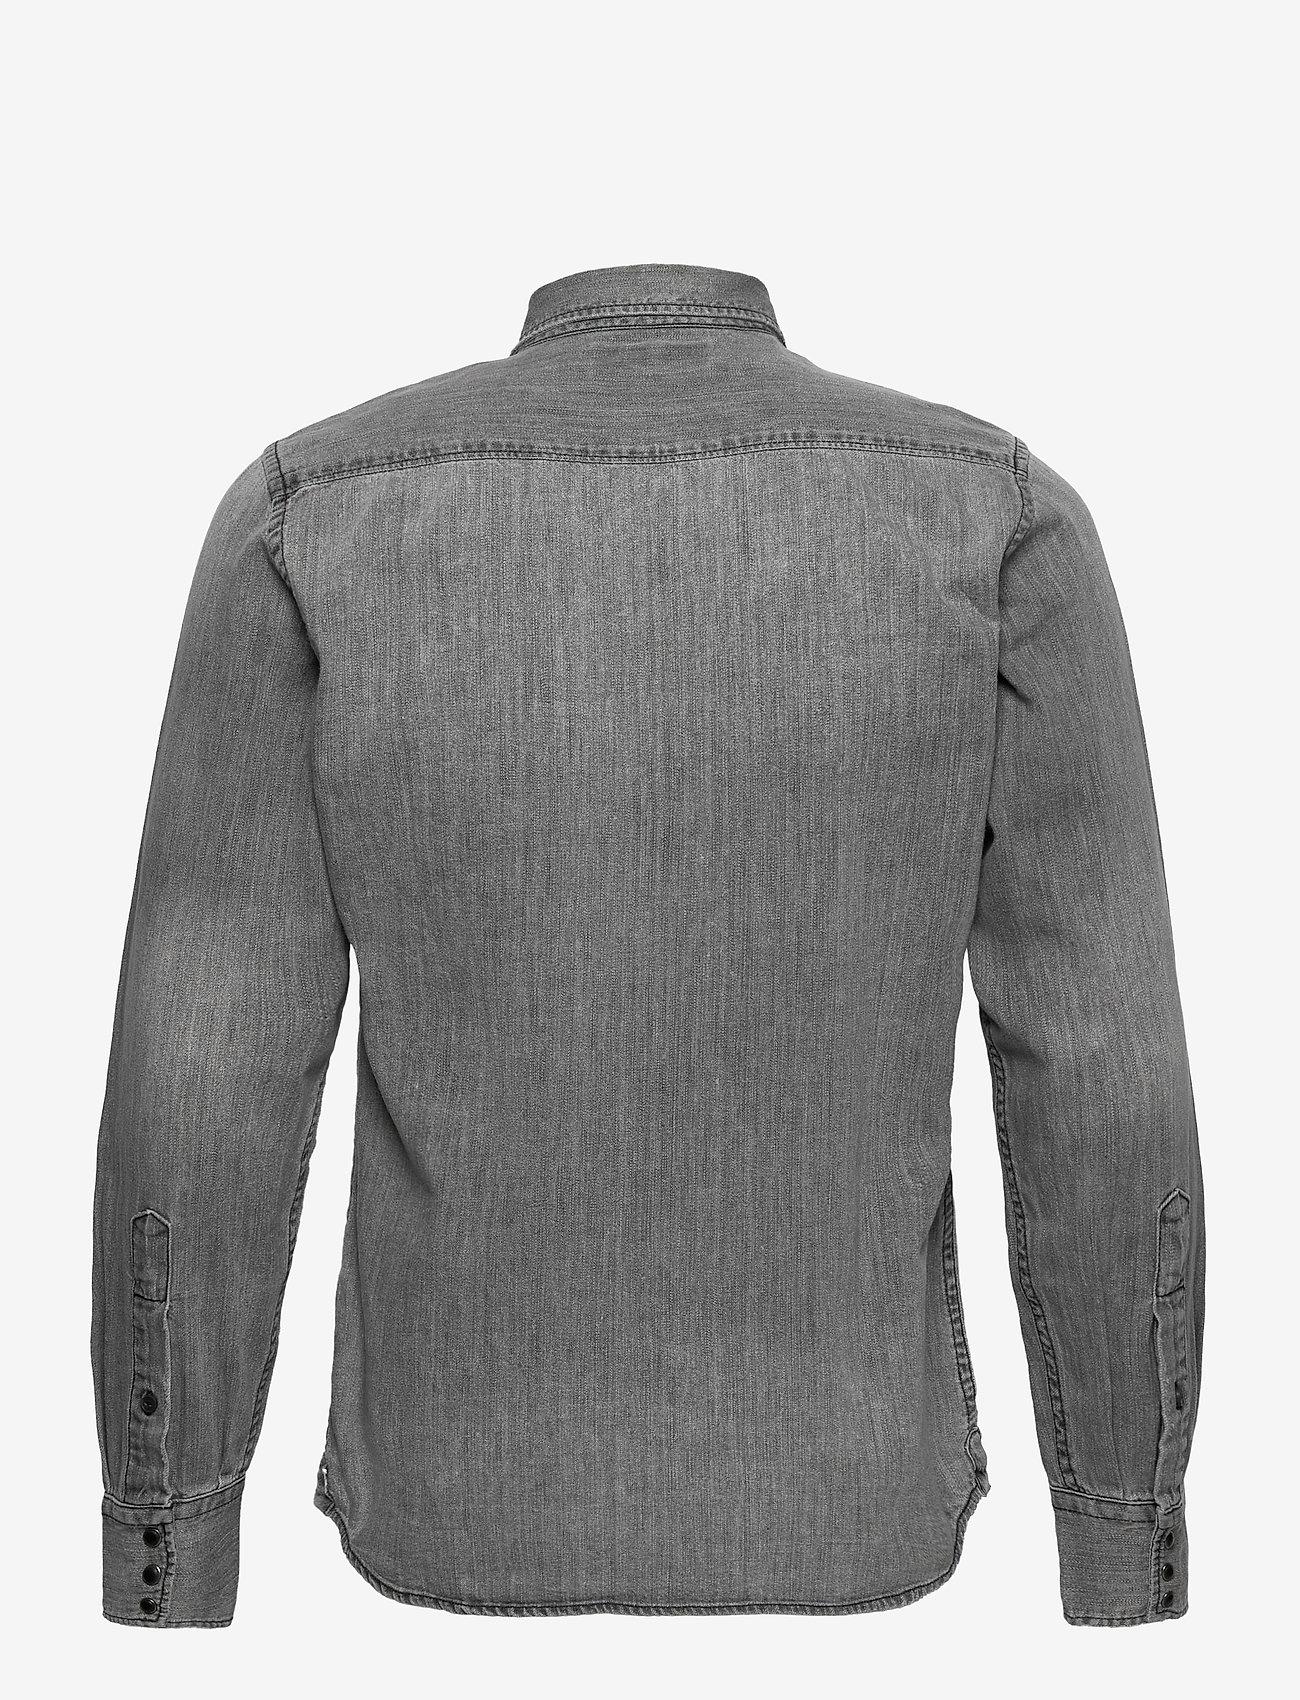 Replay - Shirt - peruspaitoja - medium grey - 1